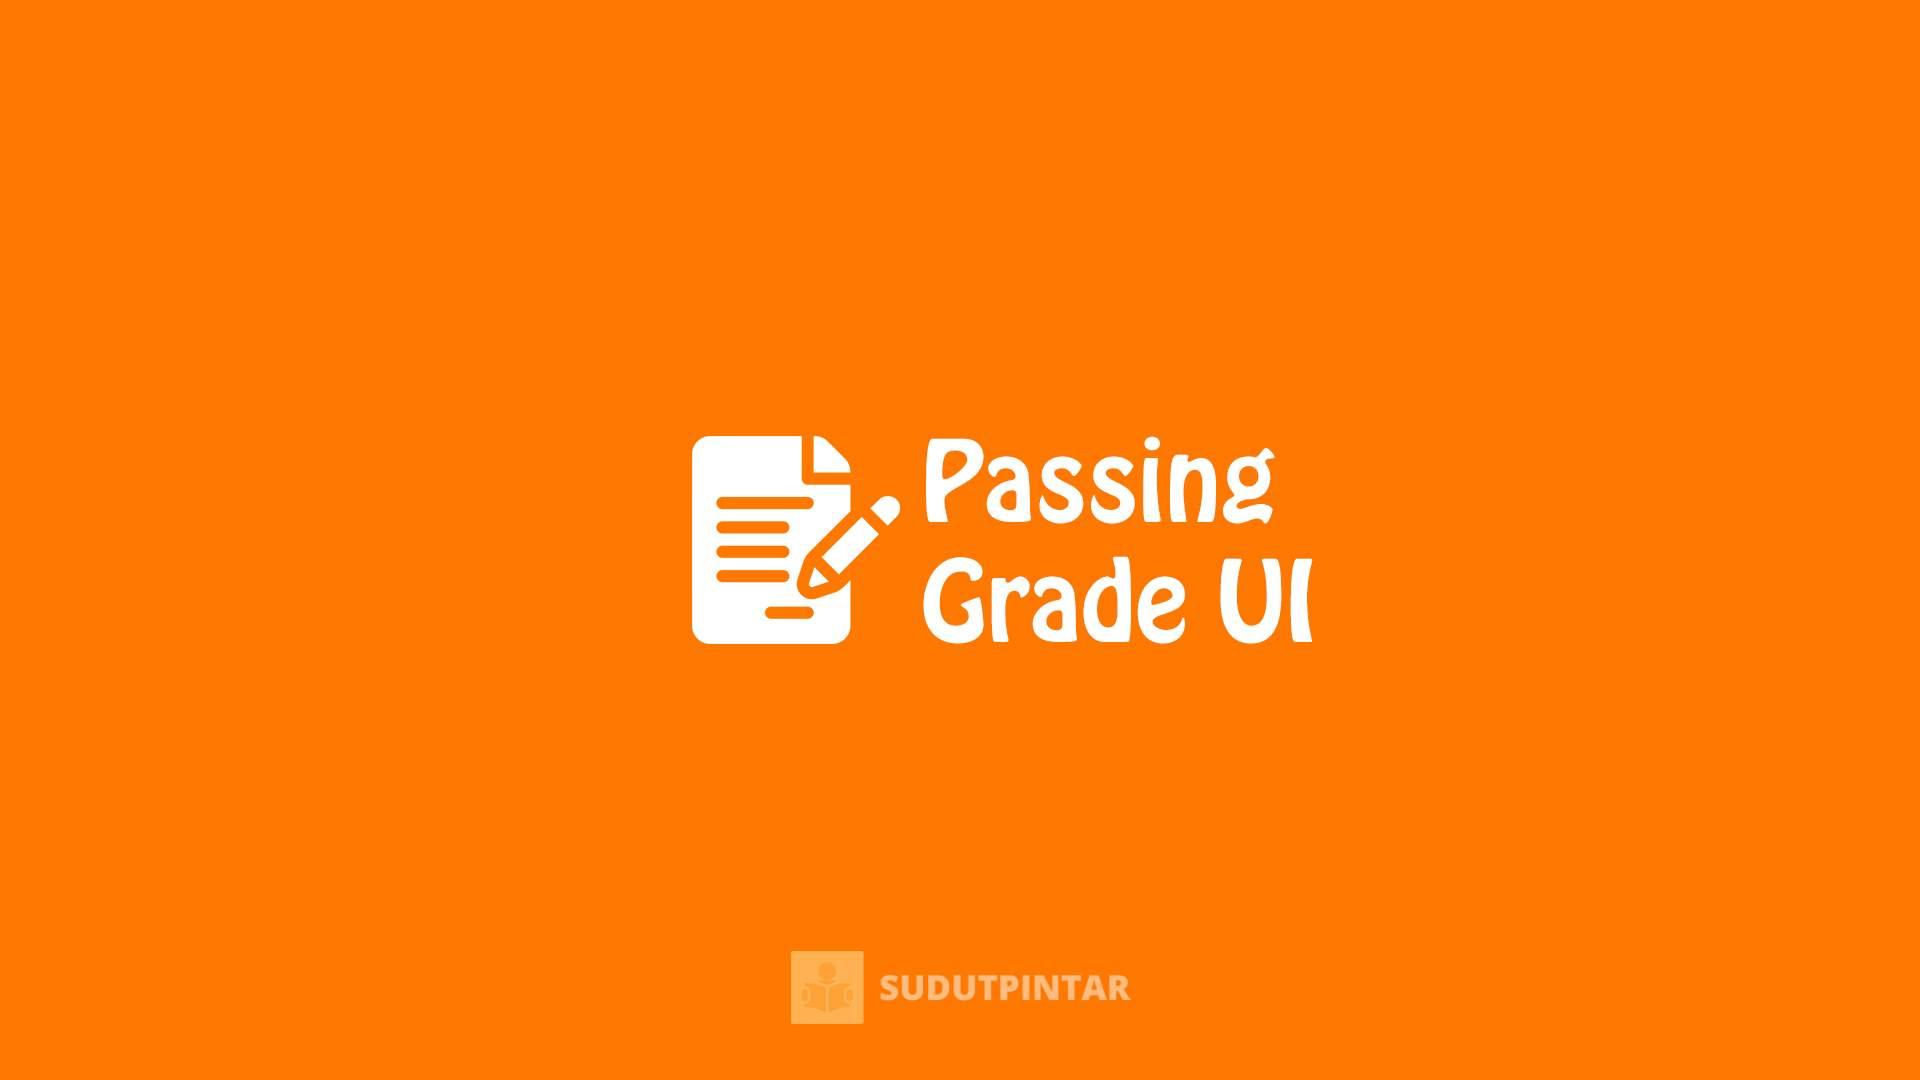 Passing Grade UI